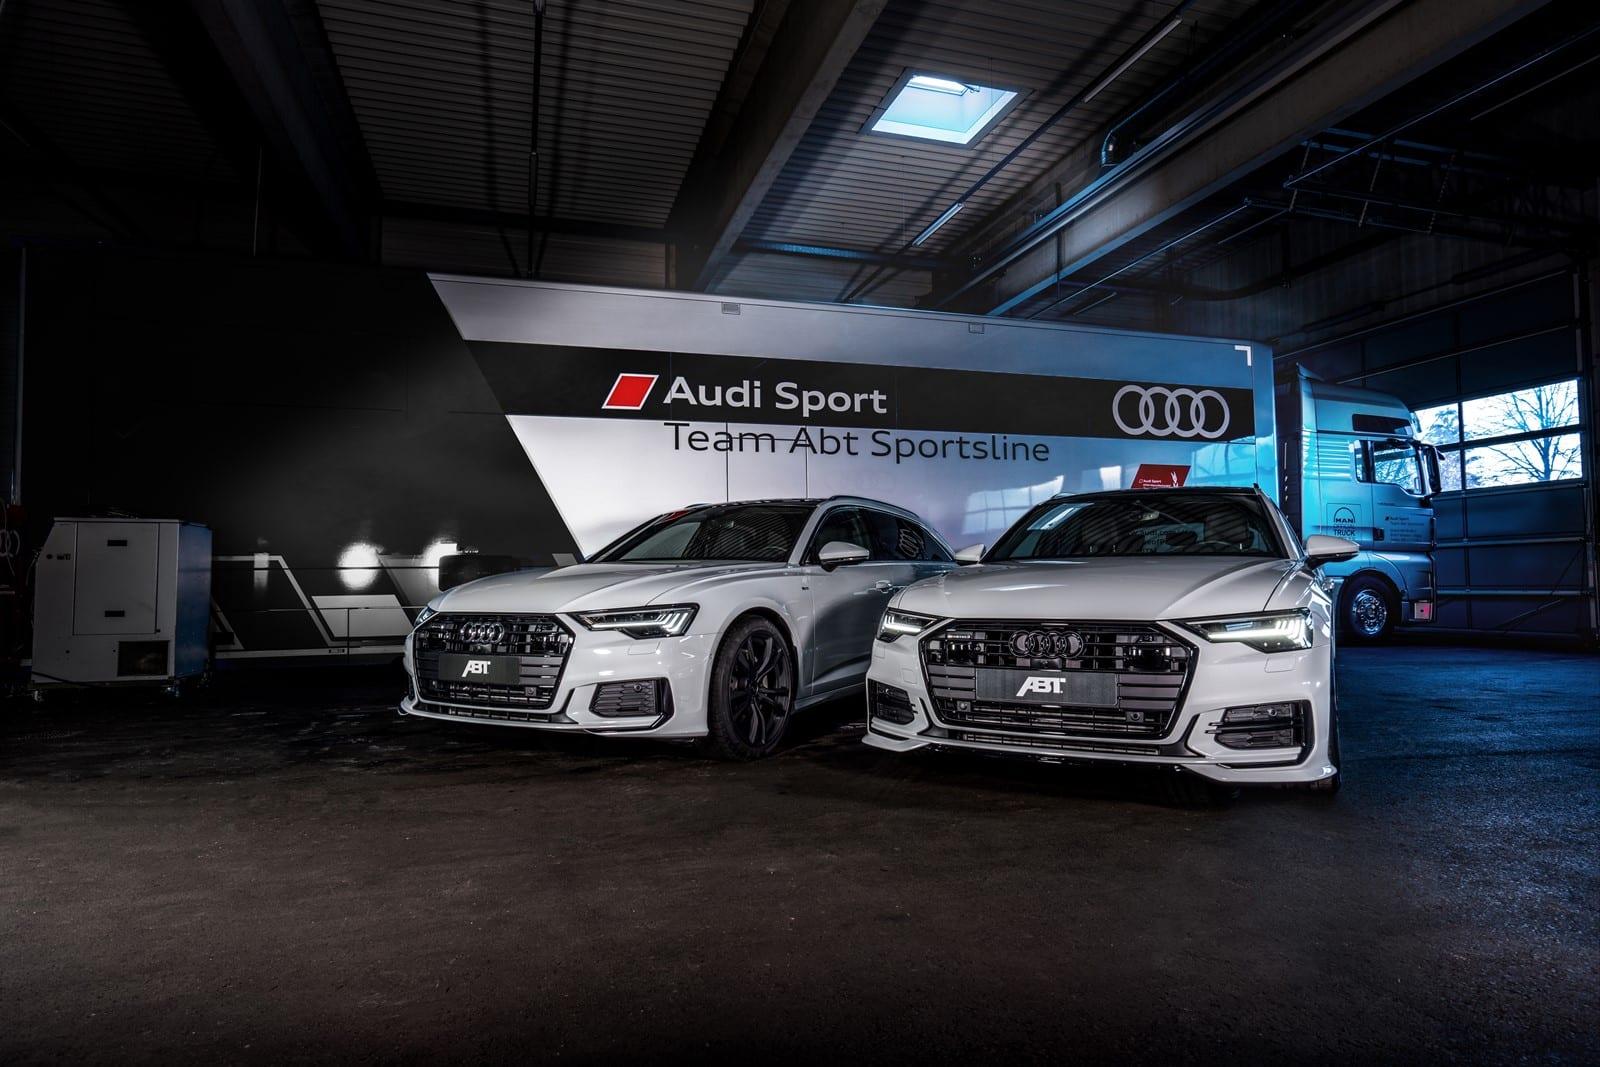 Audi-A6-Avant-ABT-aero-package-1.jpg